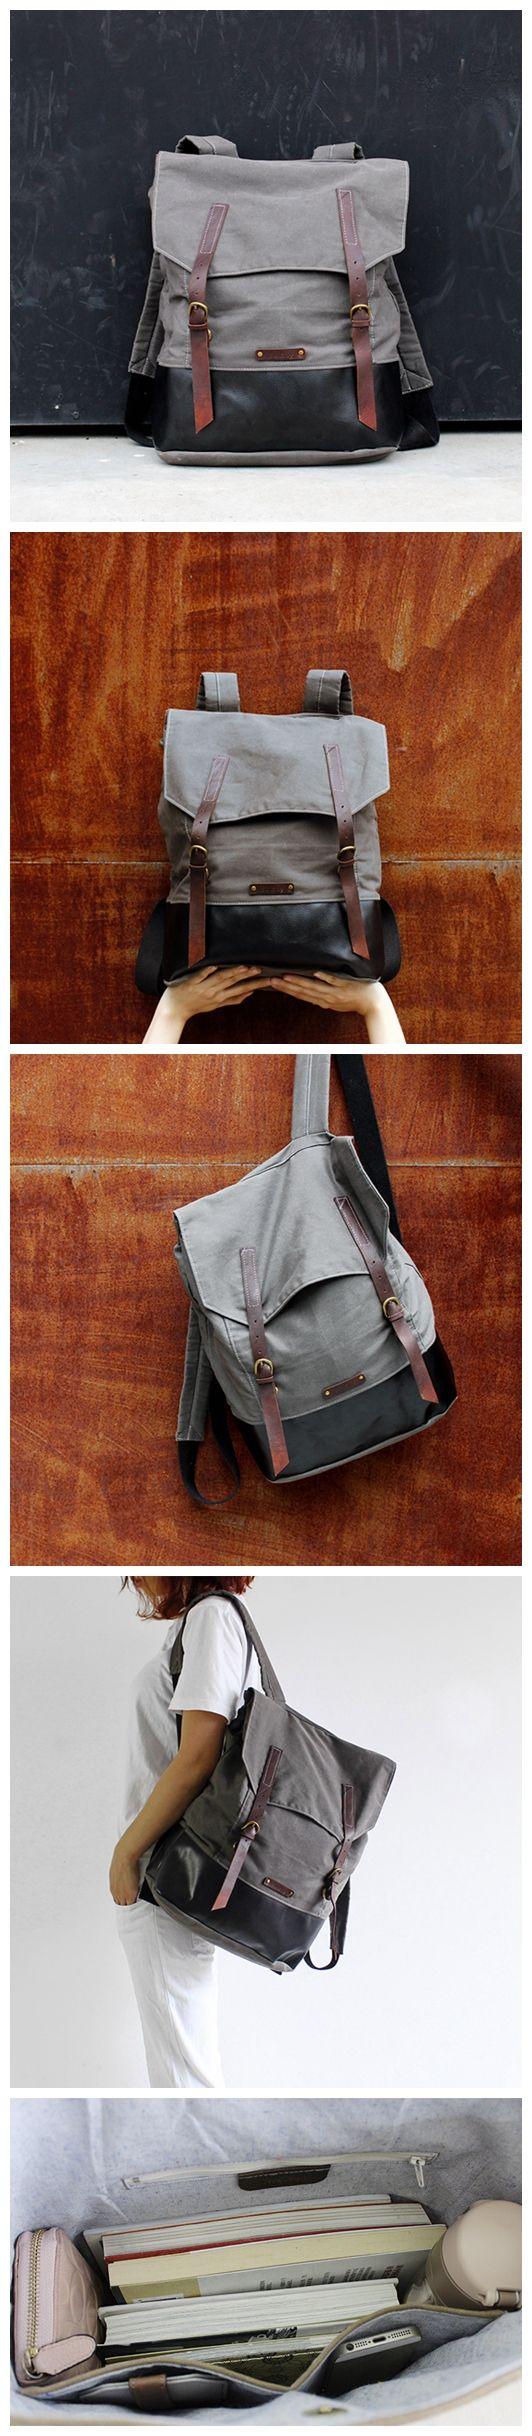 Handmade Waxed Canvas School Backpack Casual Rucksack Travel Backpack Laptop Bag 14057